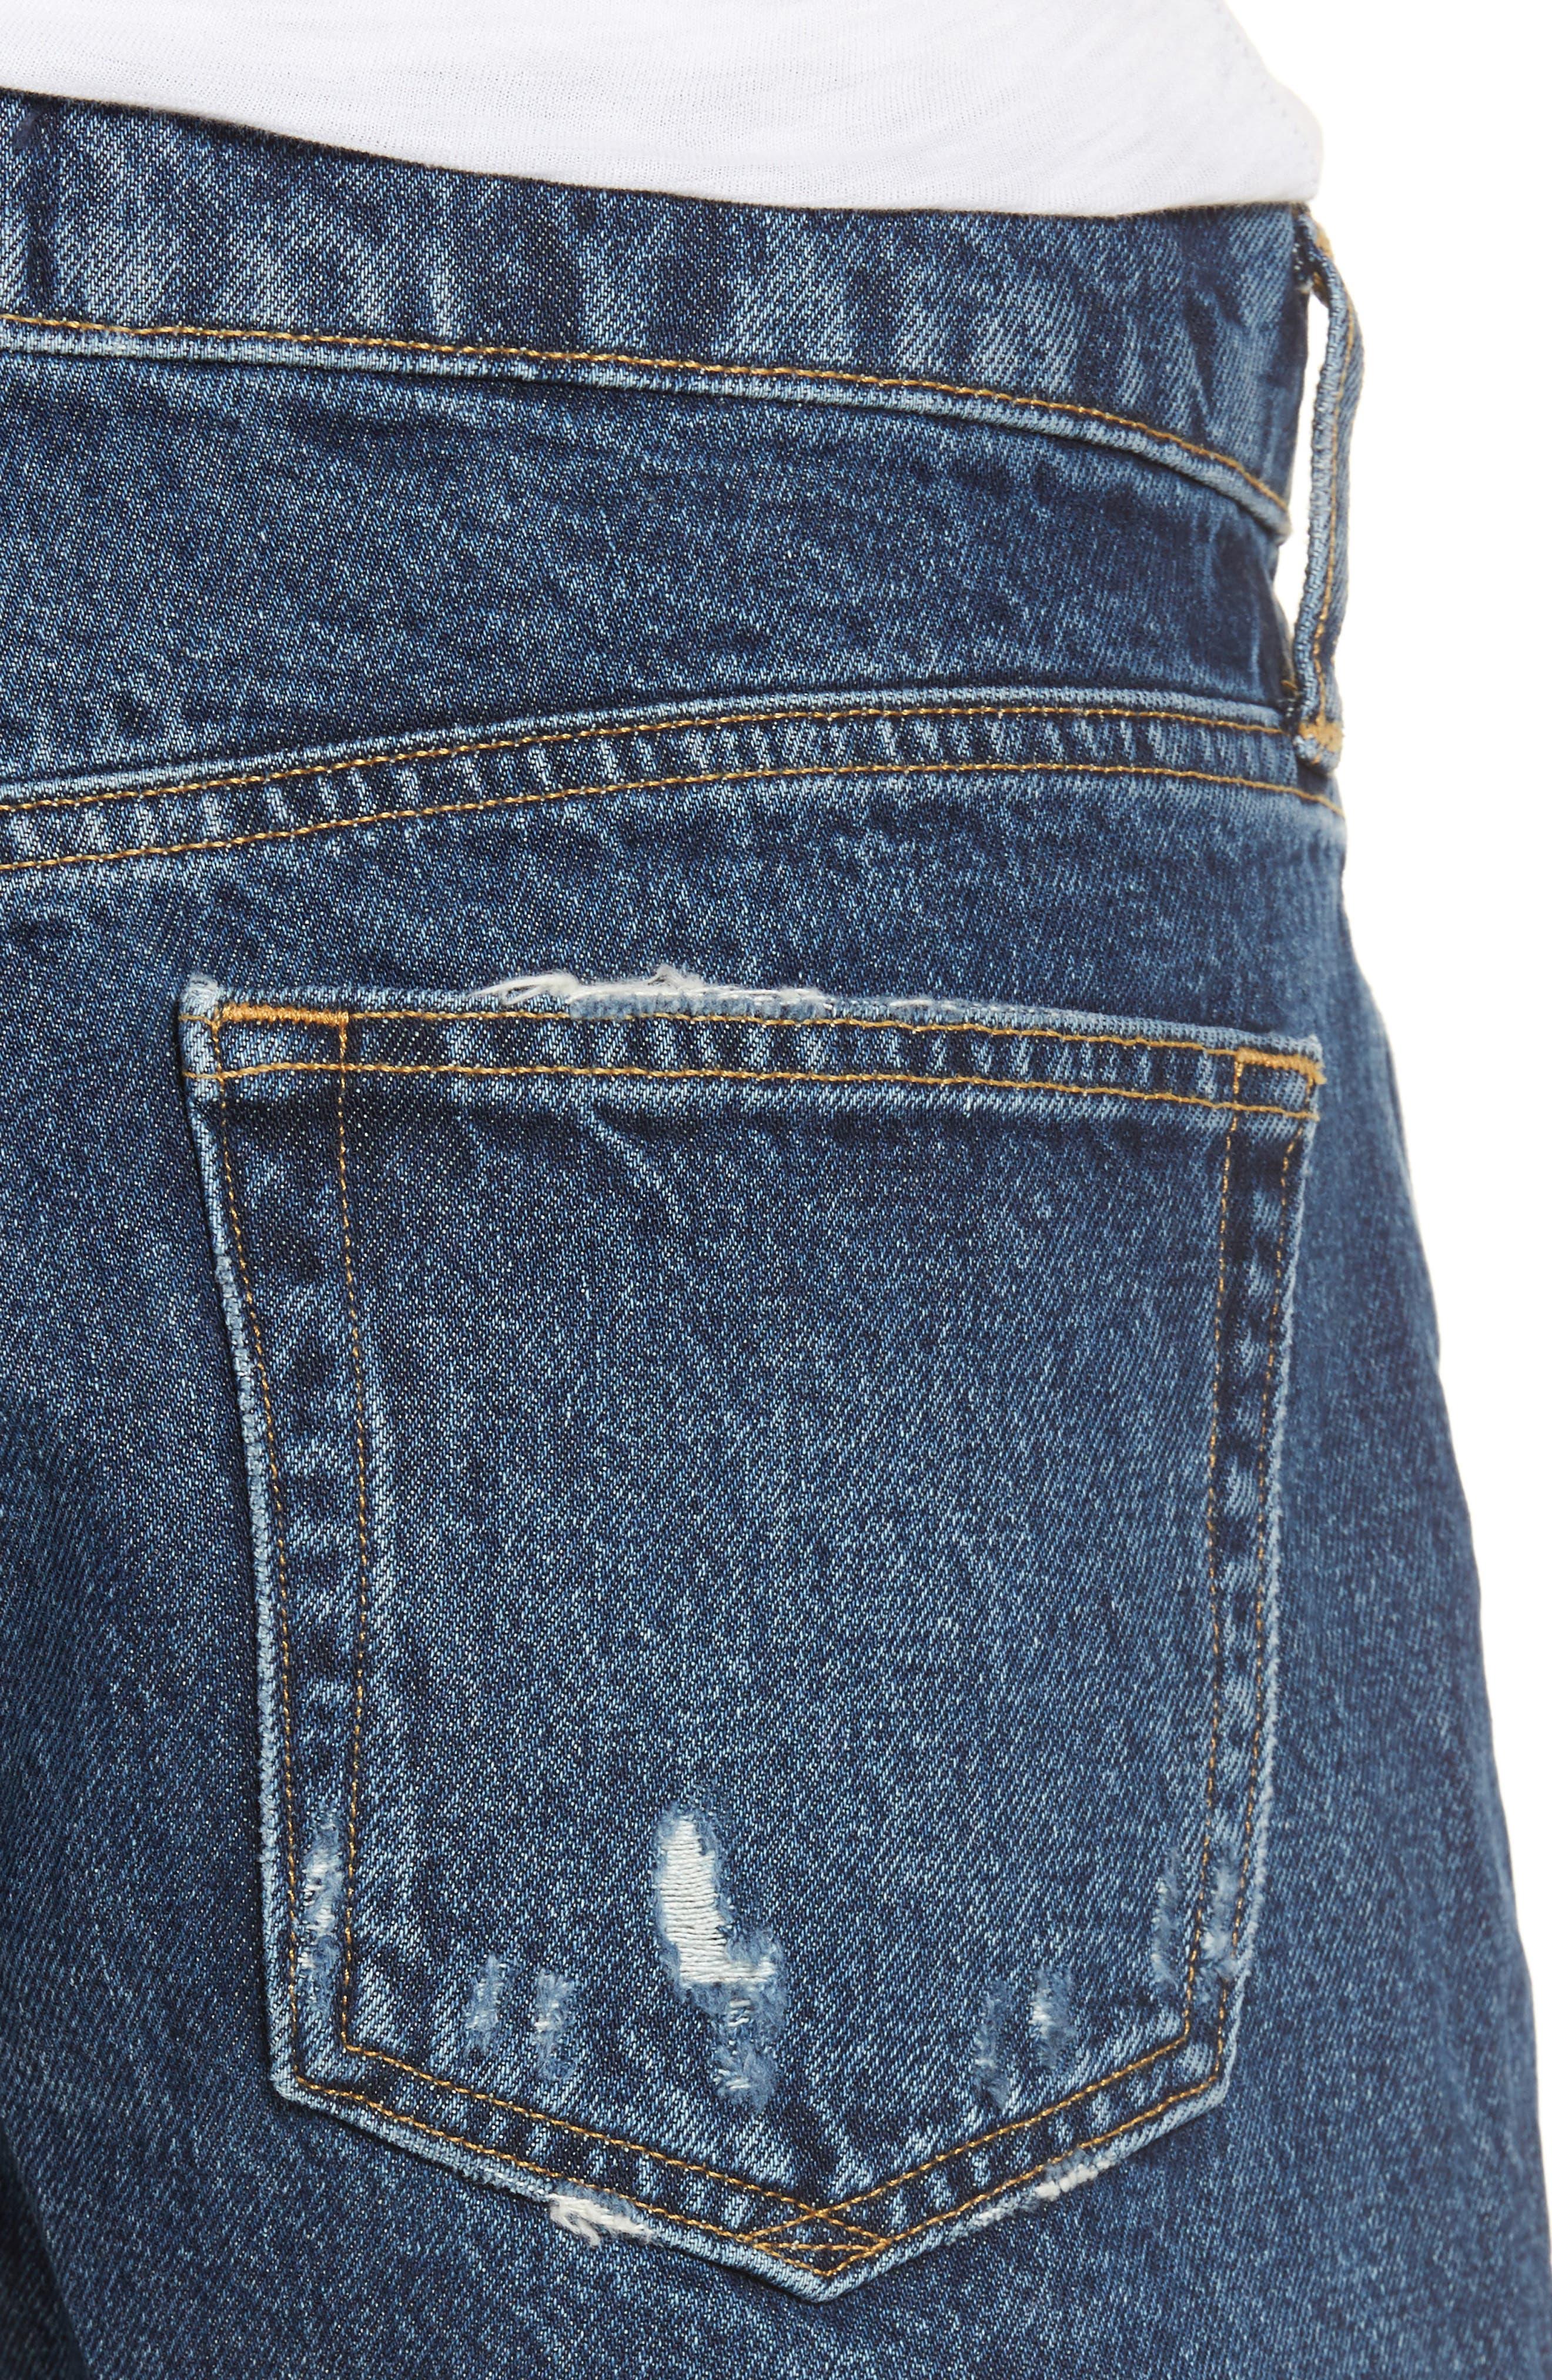 Parker Distressed Denim Shorts,                             Alternate thumbnail 4, color,                             474